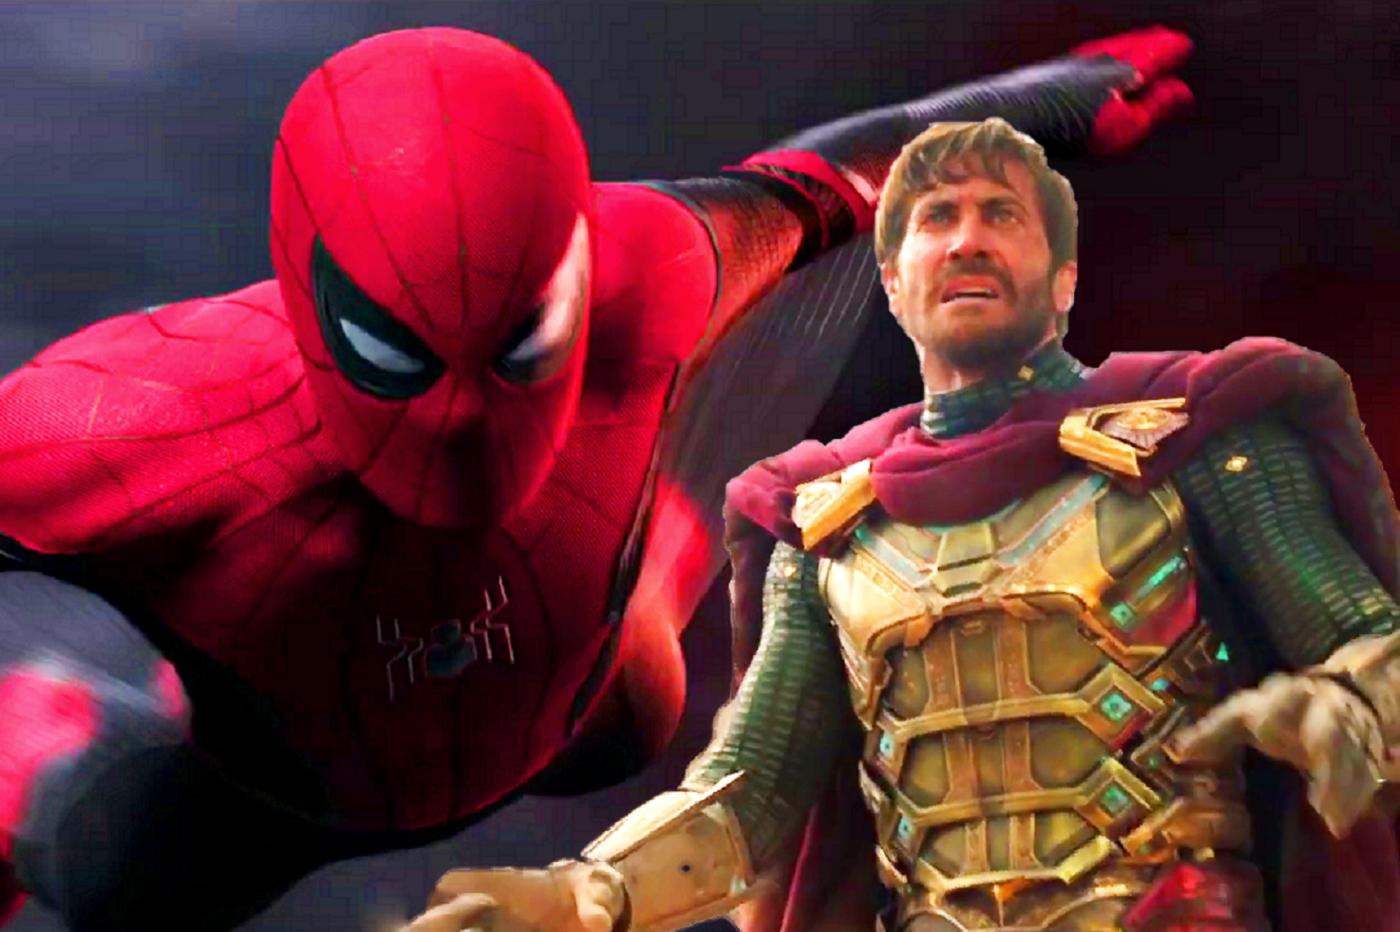 Spider-Man Far From Home : analyse et théories sur Avengers 4 Endgame